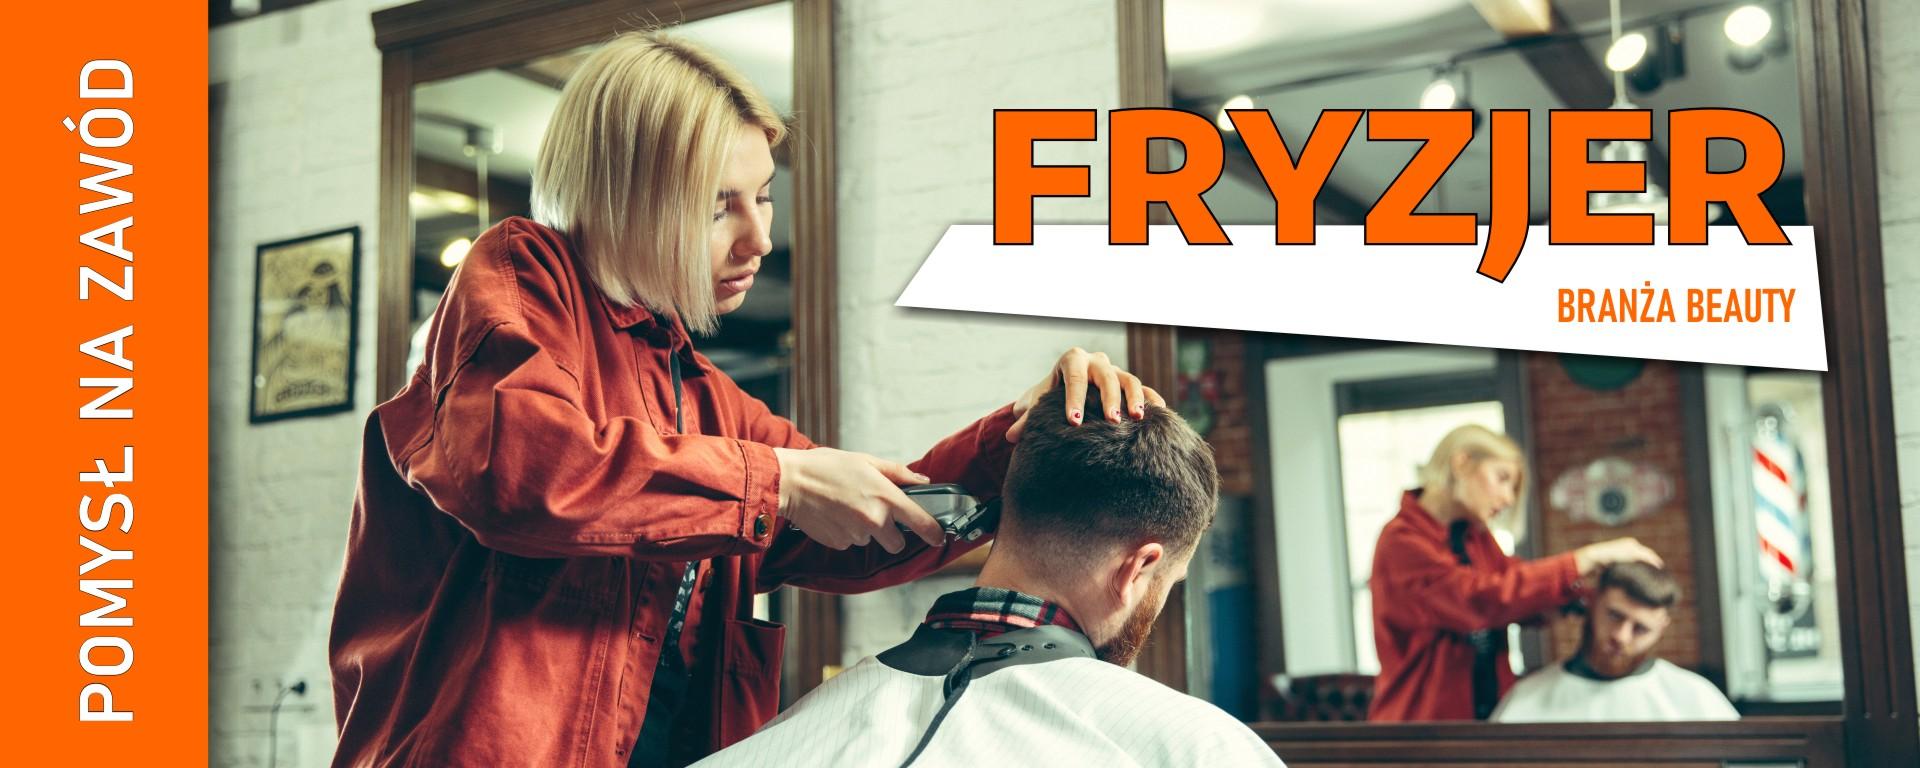 Baner - zawód fryzjer